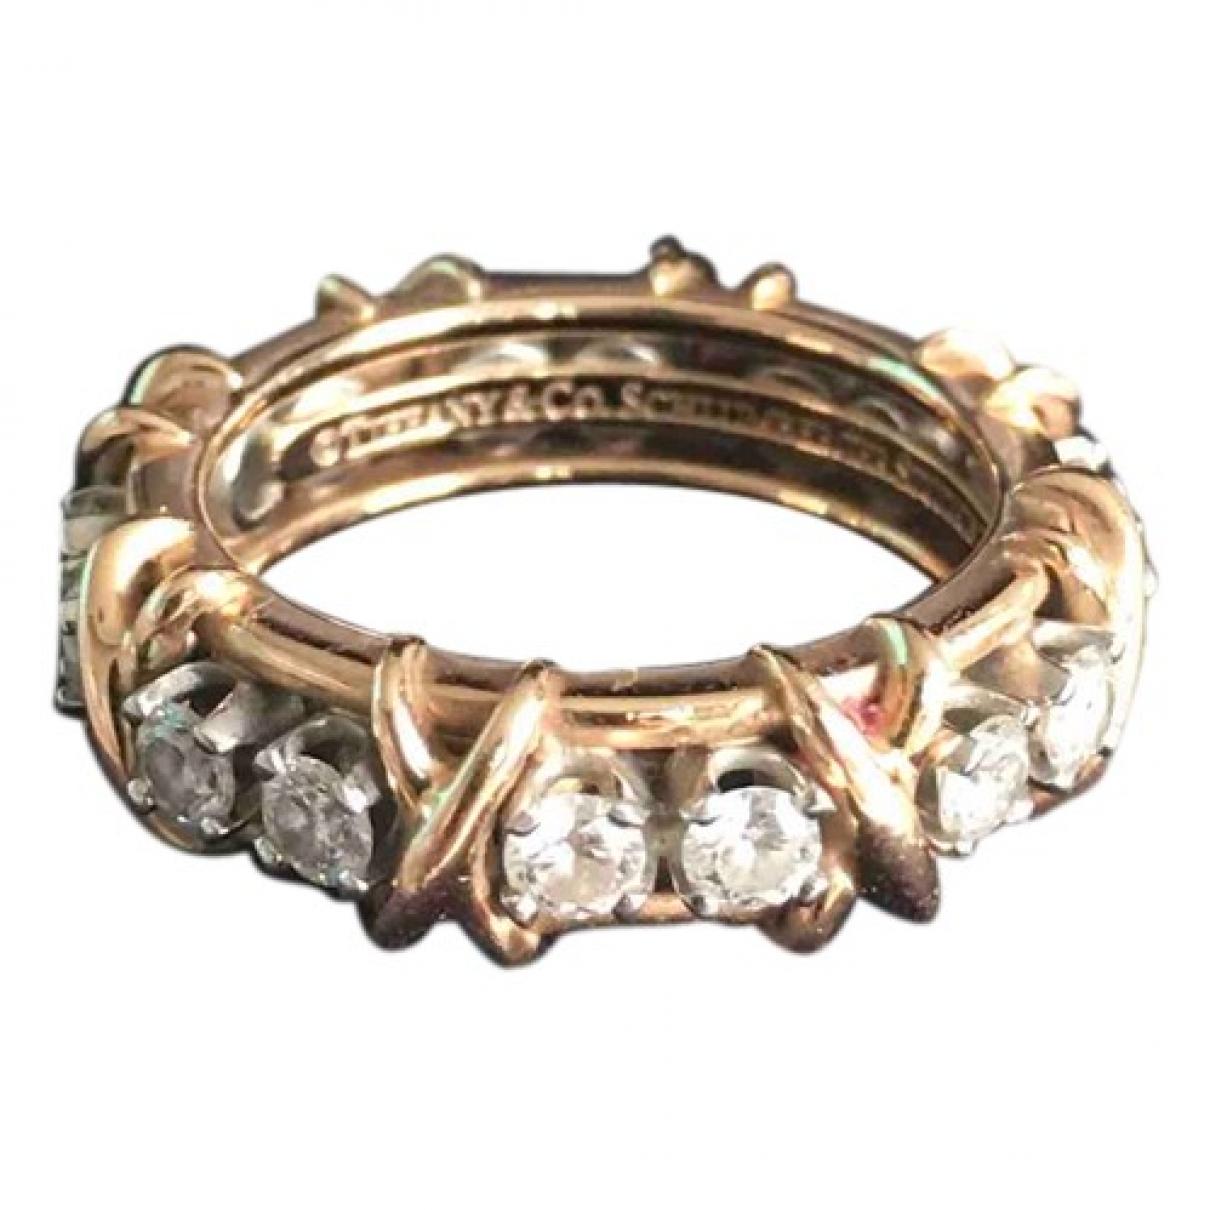 Tiffany & Co - Bague Schlumberger pour femme en or rose - dore